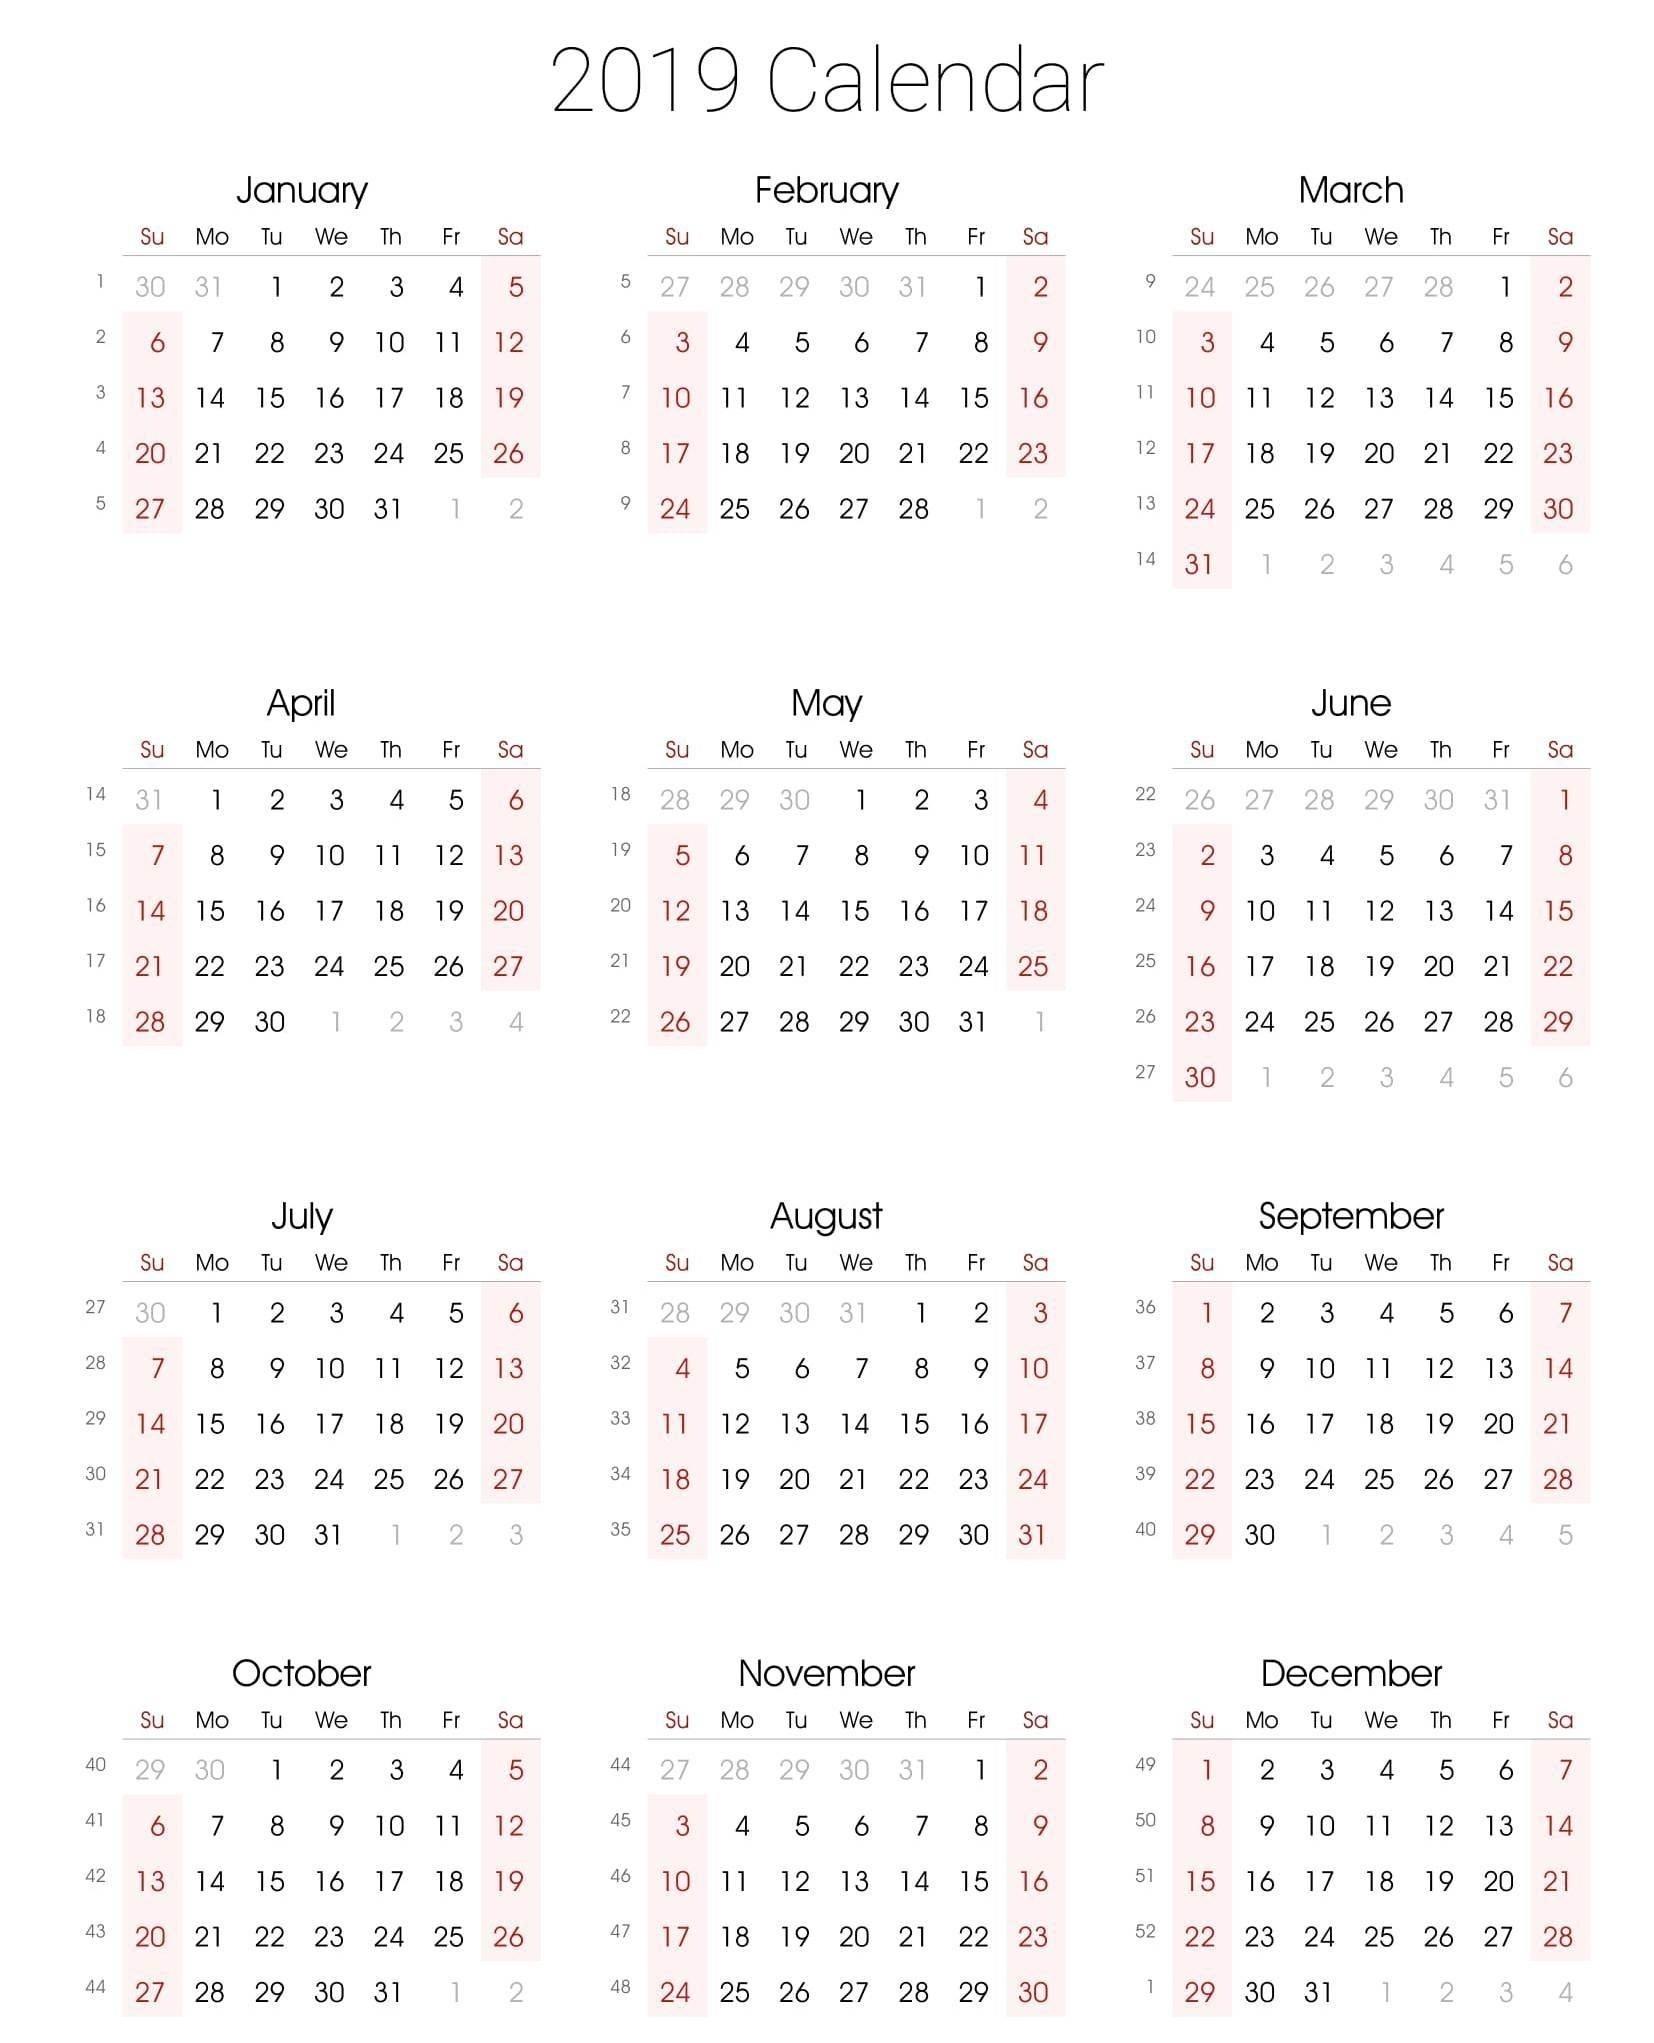 Calendar Template By Vertex • Printable Blank Calendar Template-Calender Template By Vertex